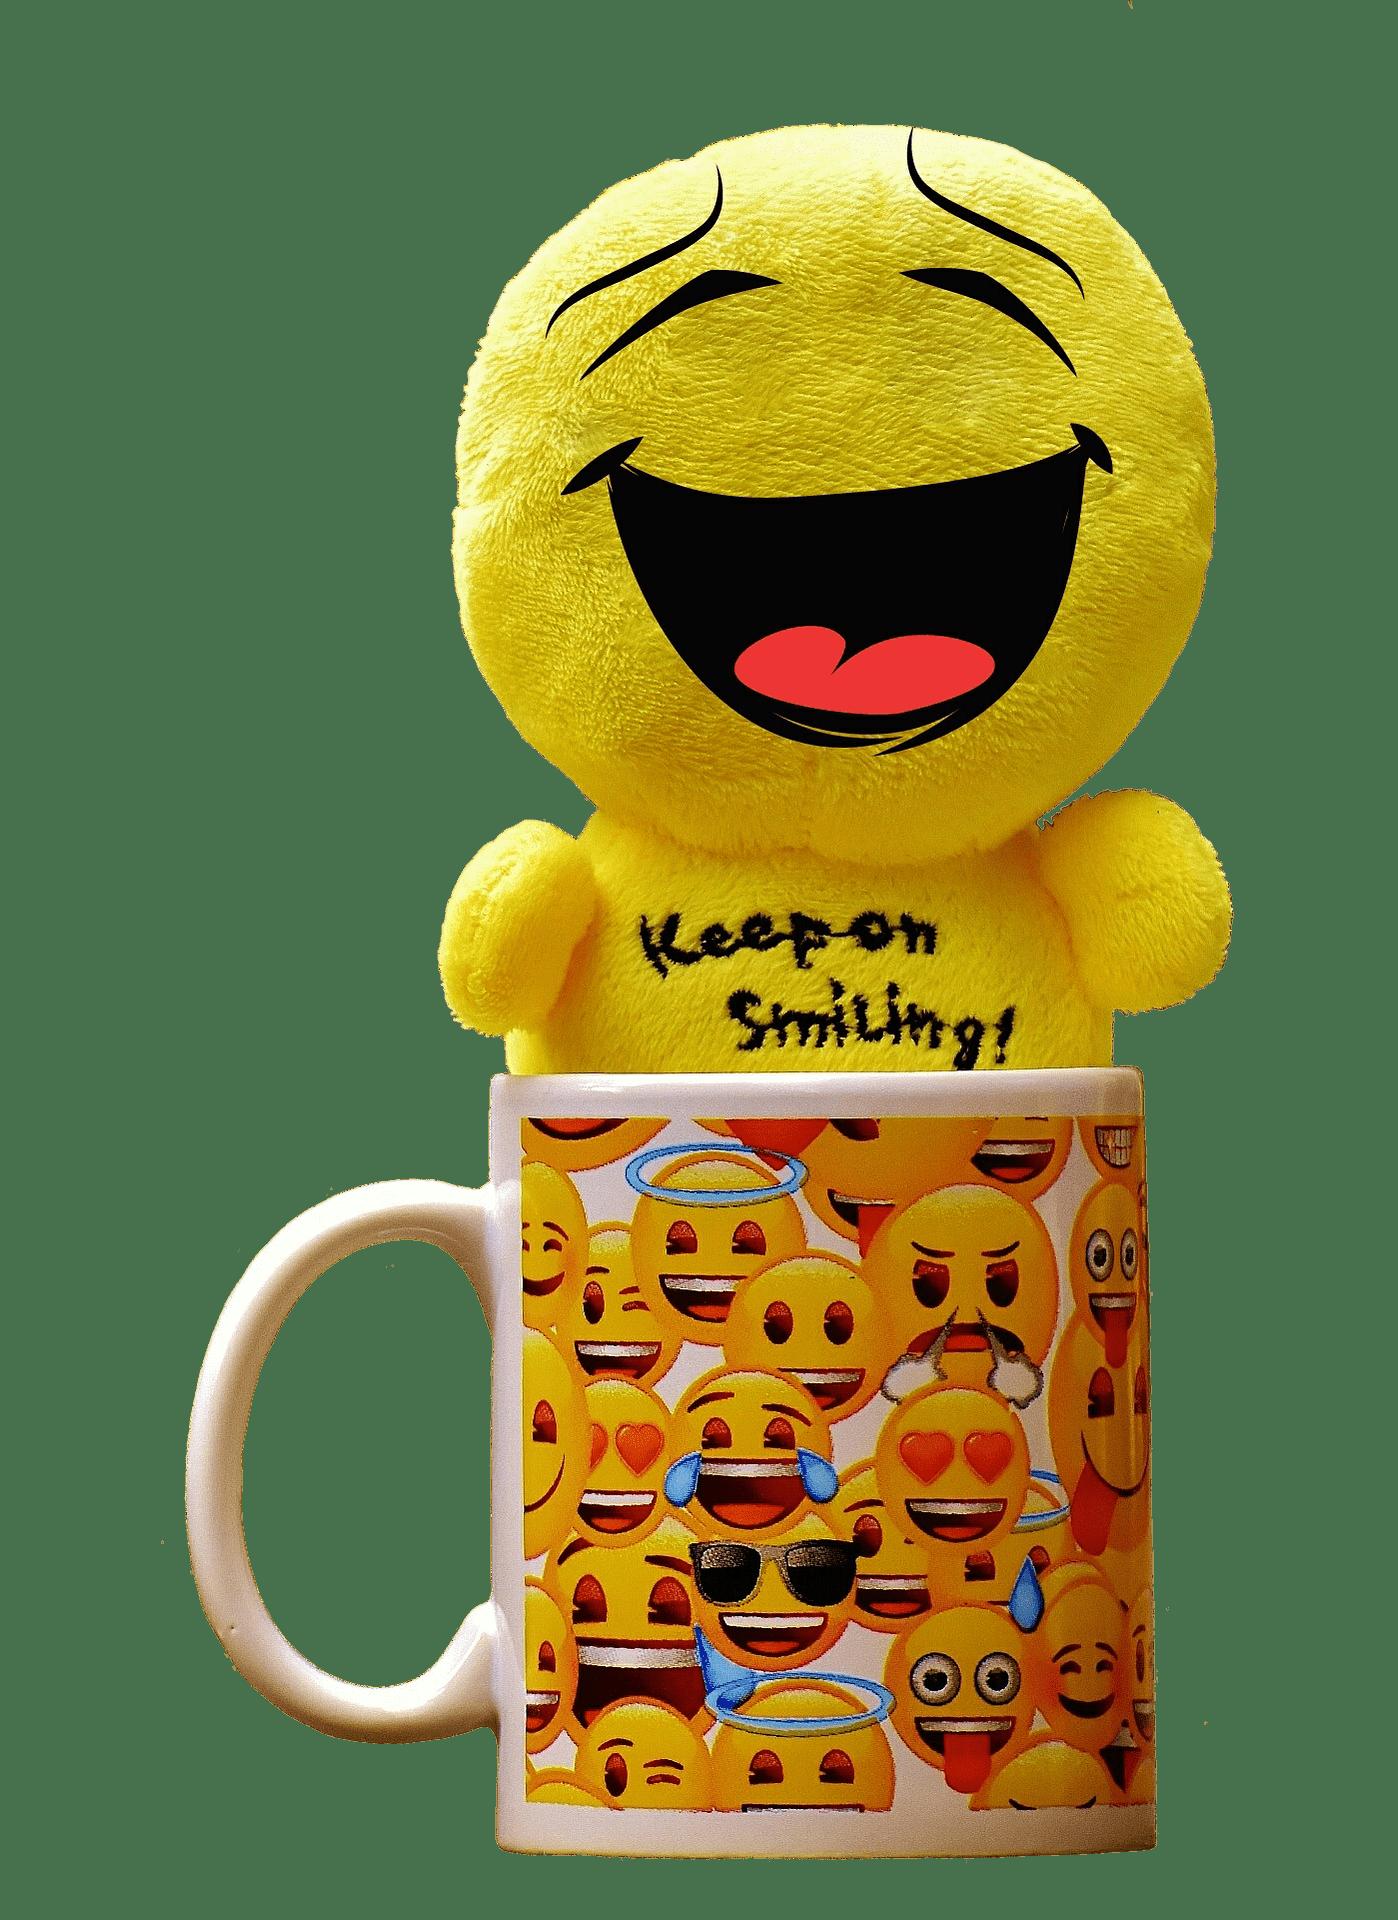 Tipp gegen Prüfungsangst: Lachen